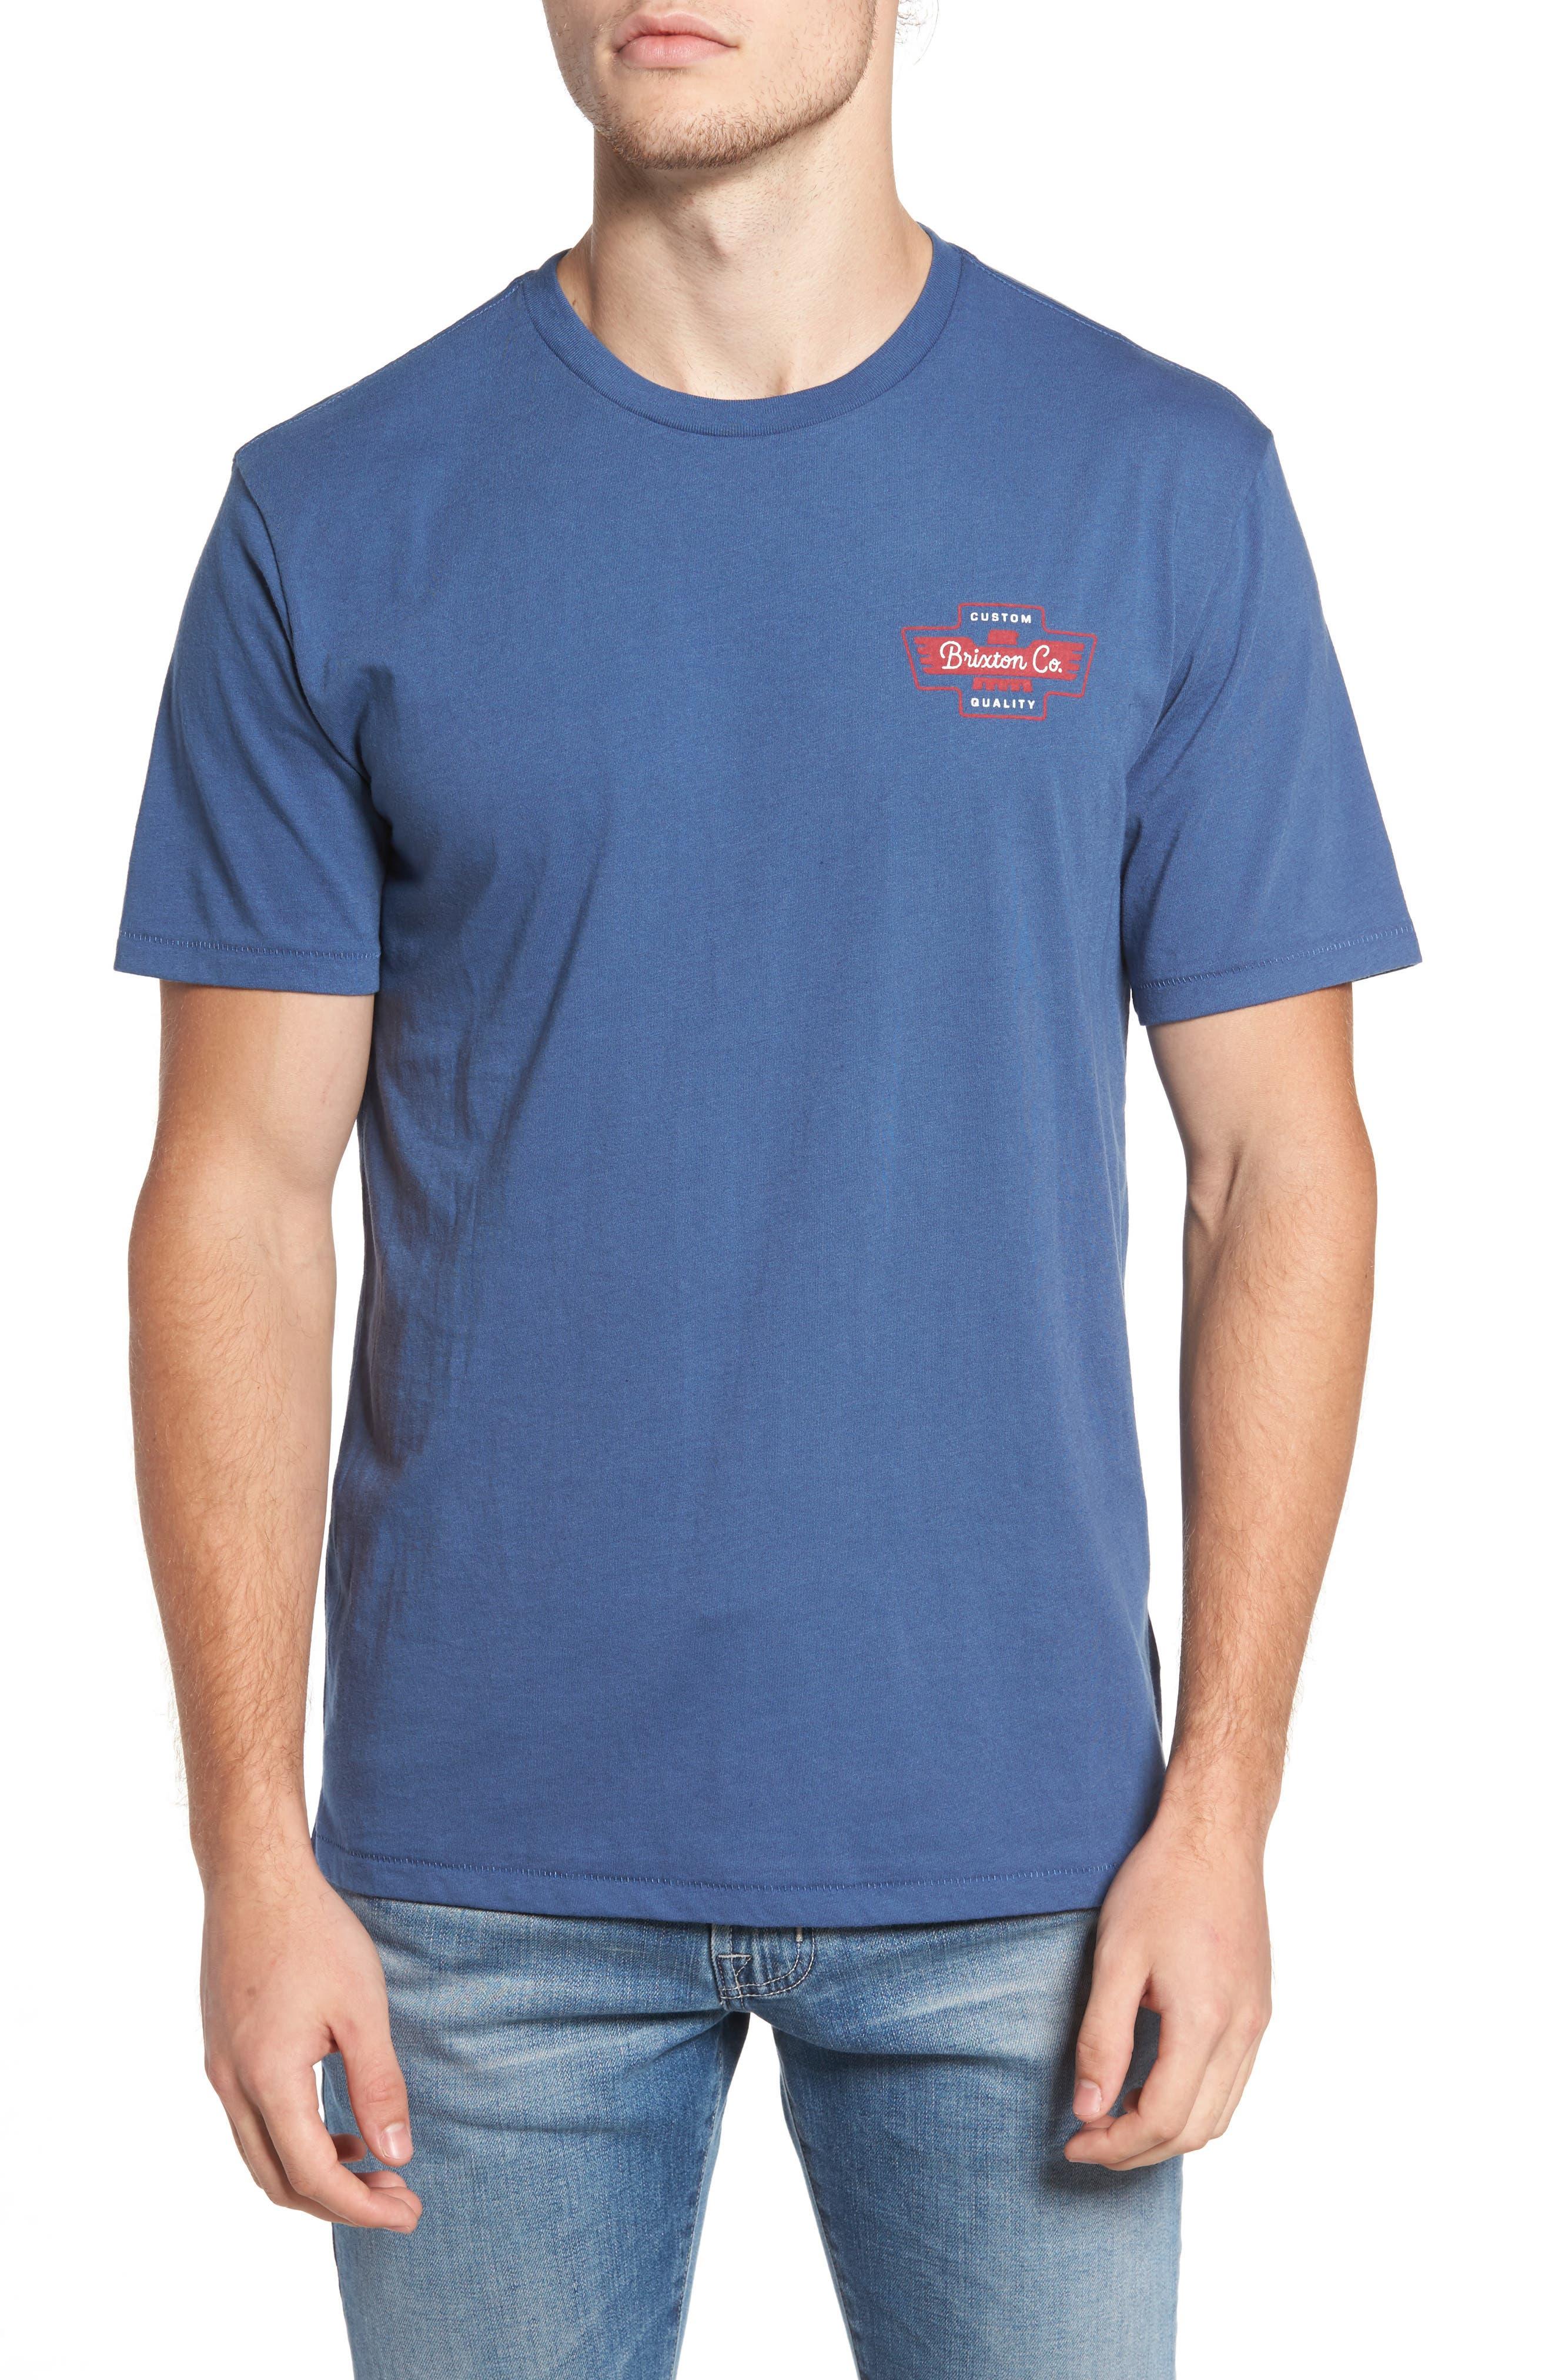 Brixton Federal Premium Graphic T-Shirt